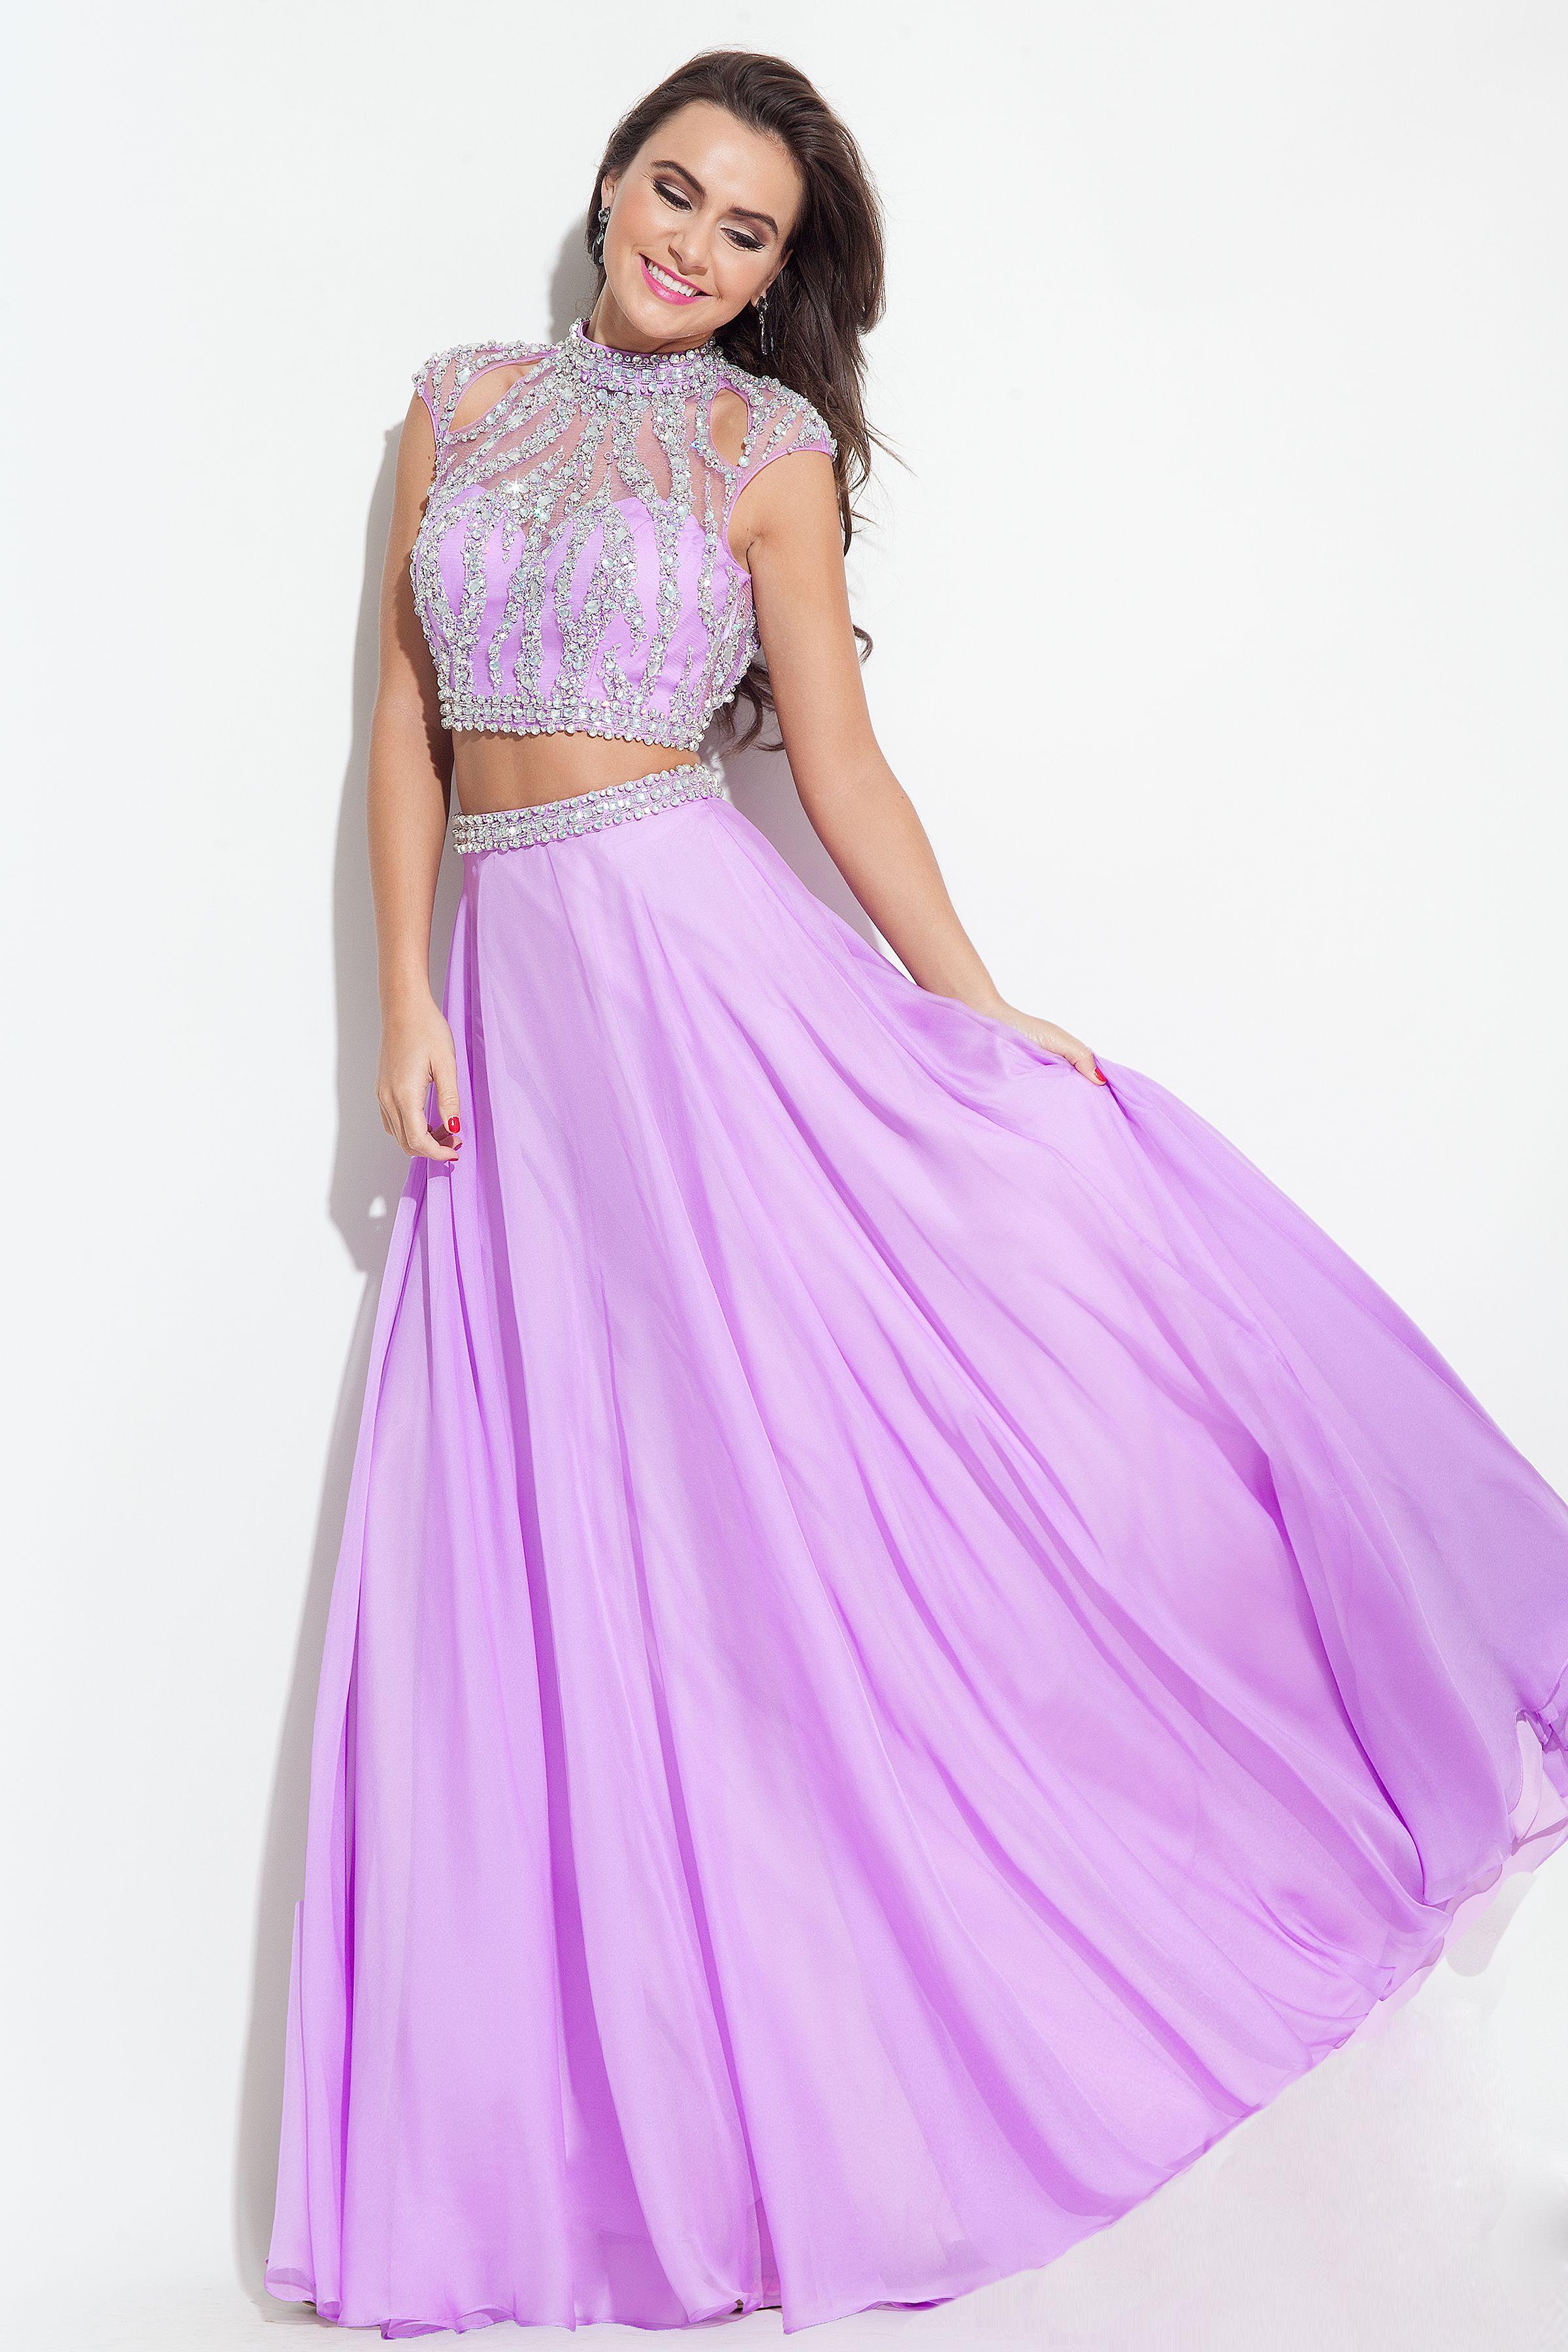 Atractivo Camille Vie Prom Dresses Embellecimiento - Ideas de ...